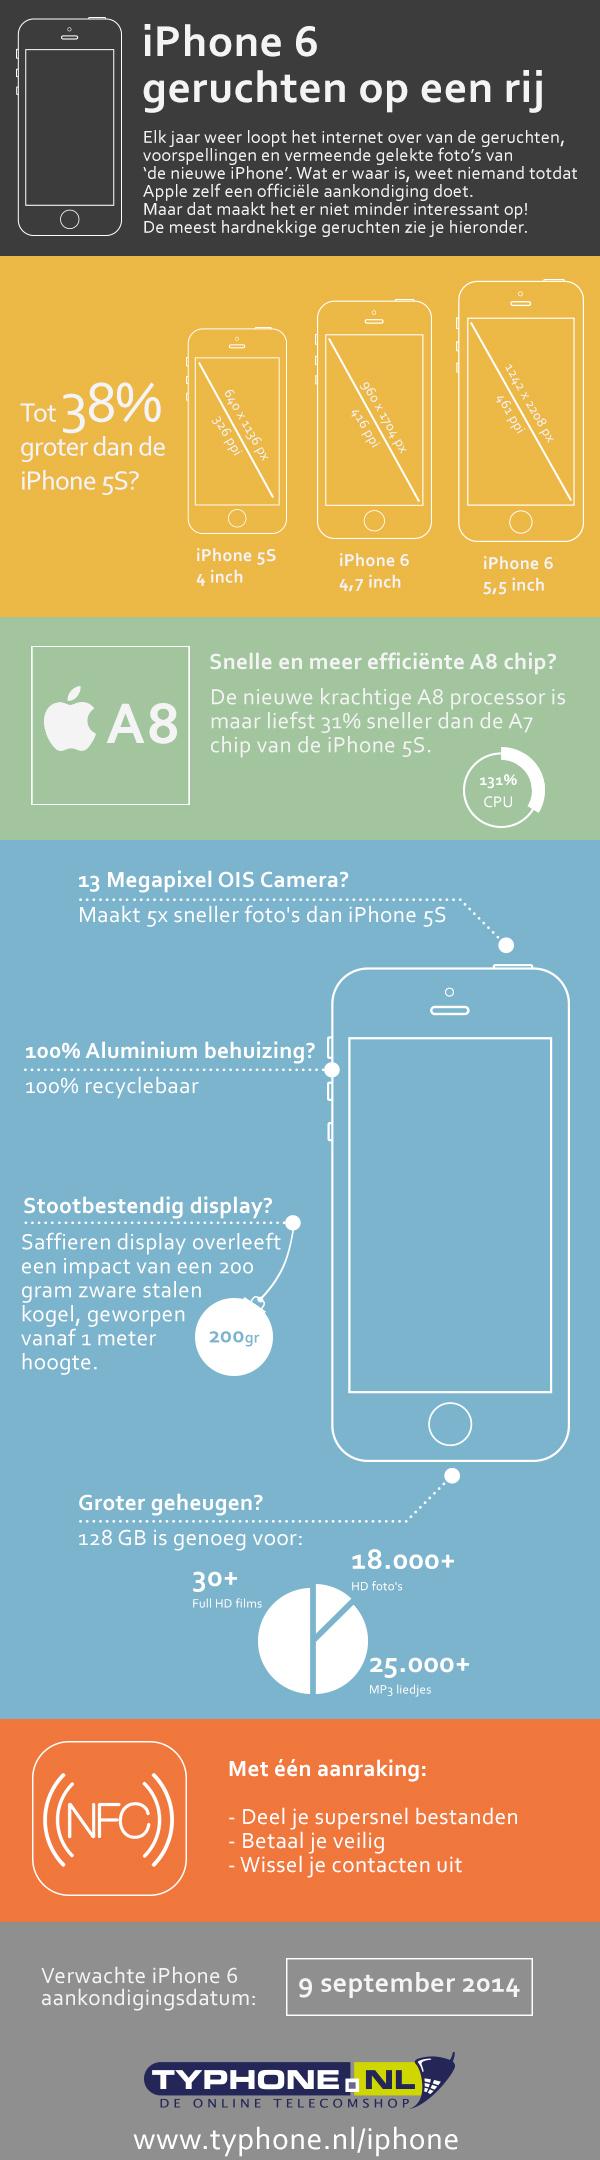 iPhone 6 geruchten